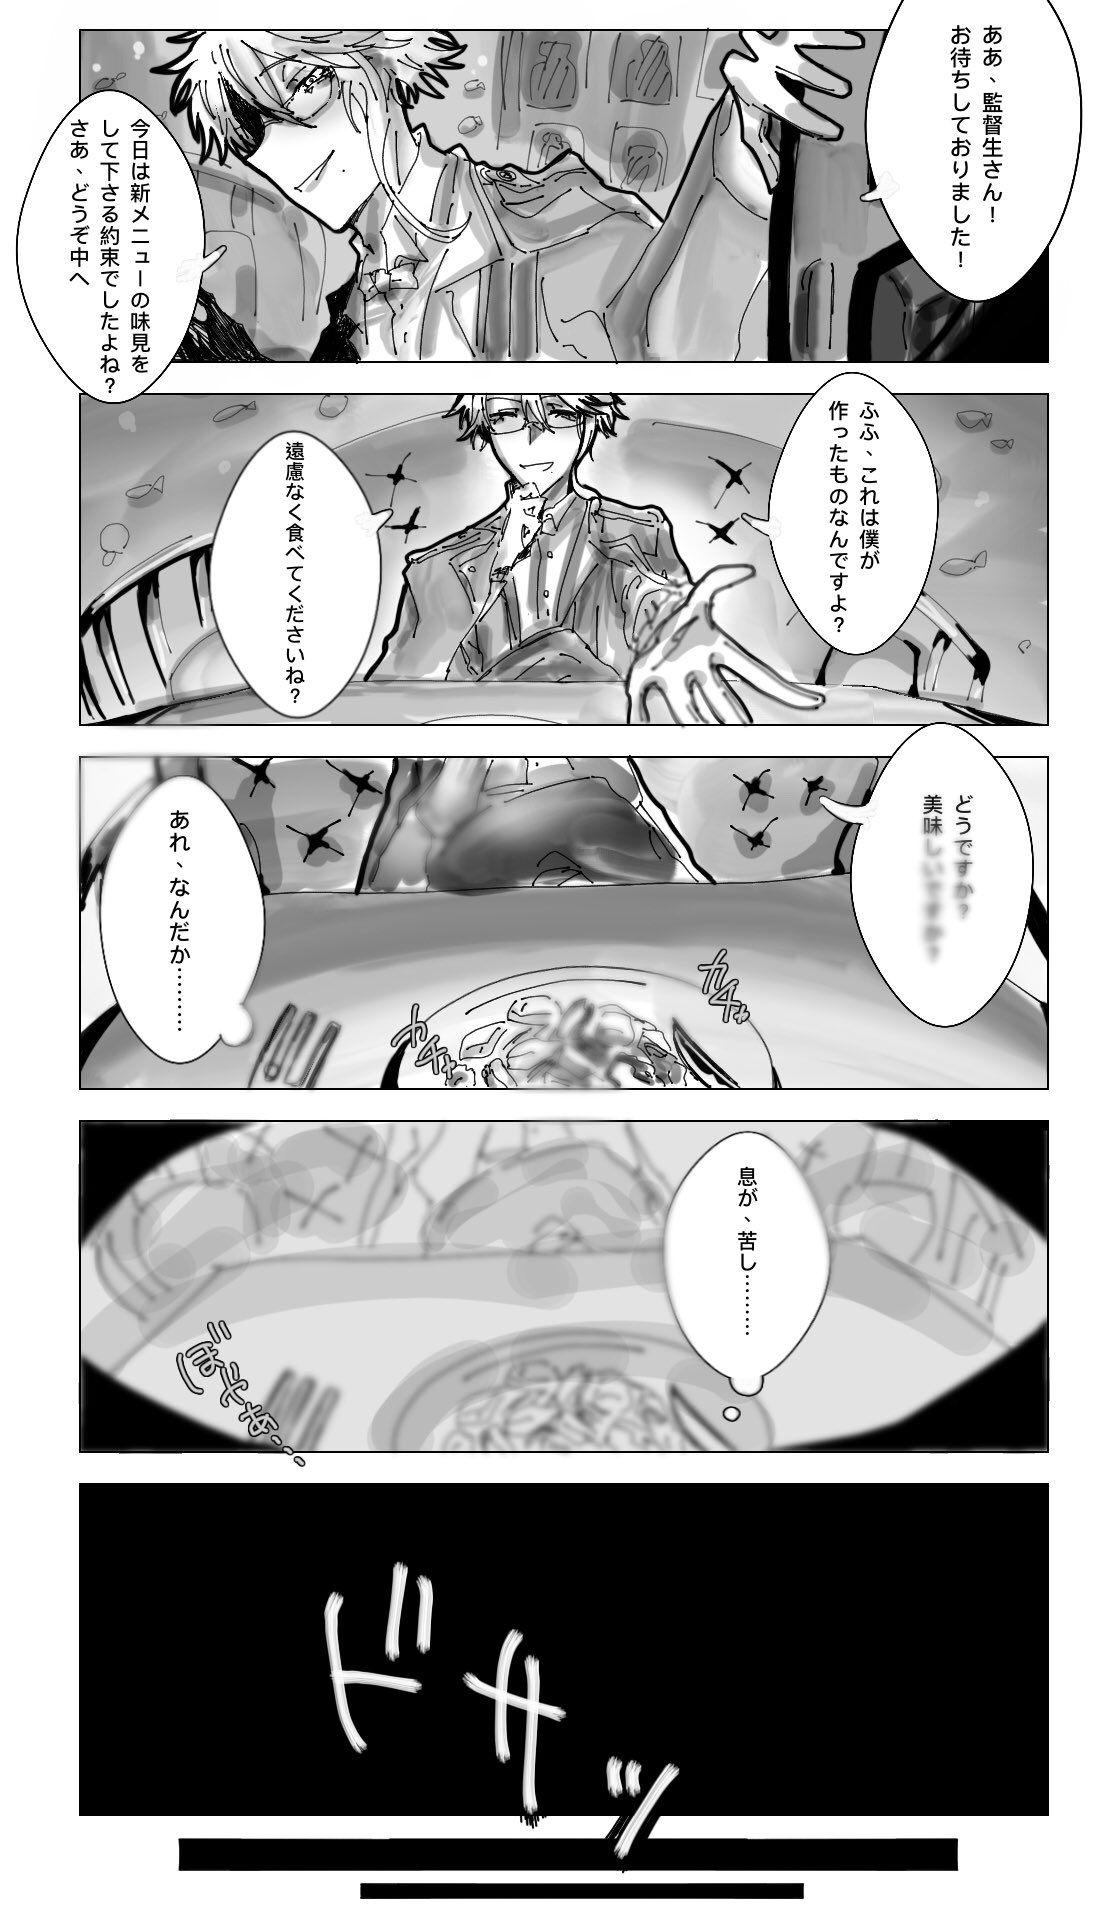 twitter オリジナル 漫画 人魚 イラスト ツイステッド